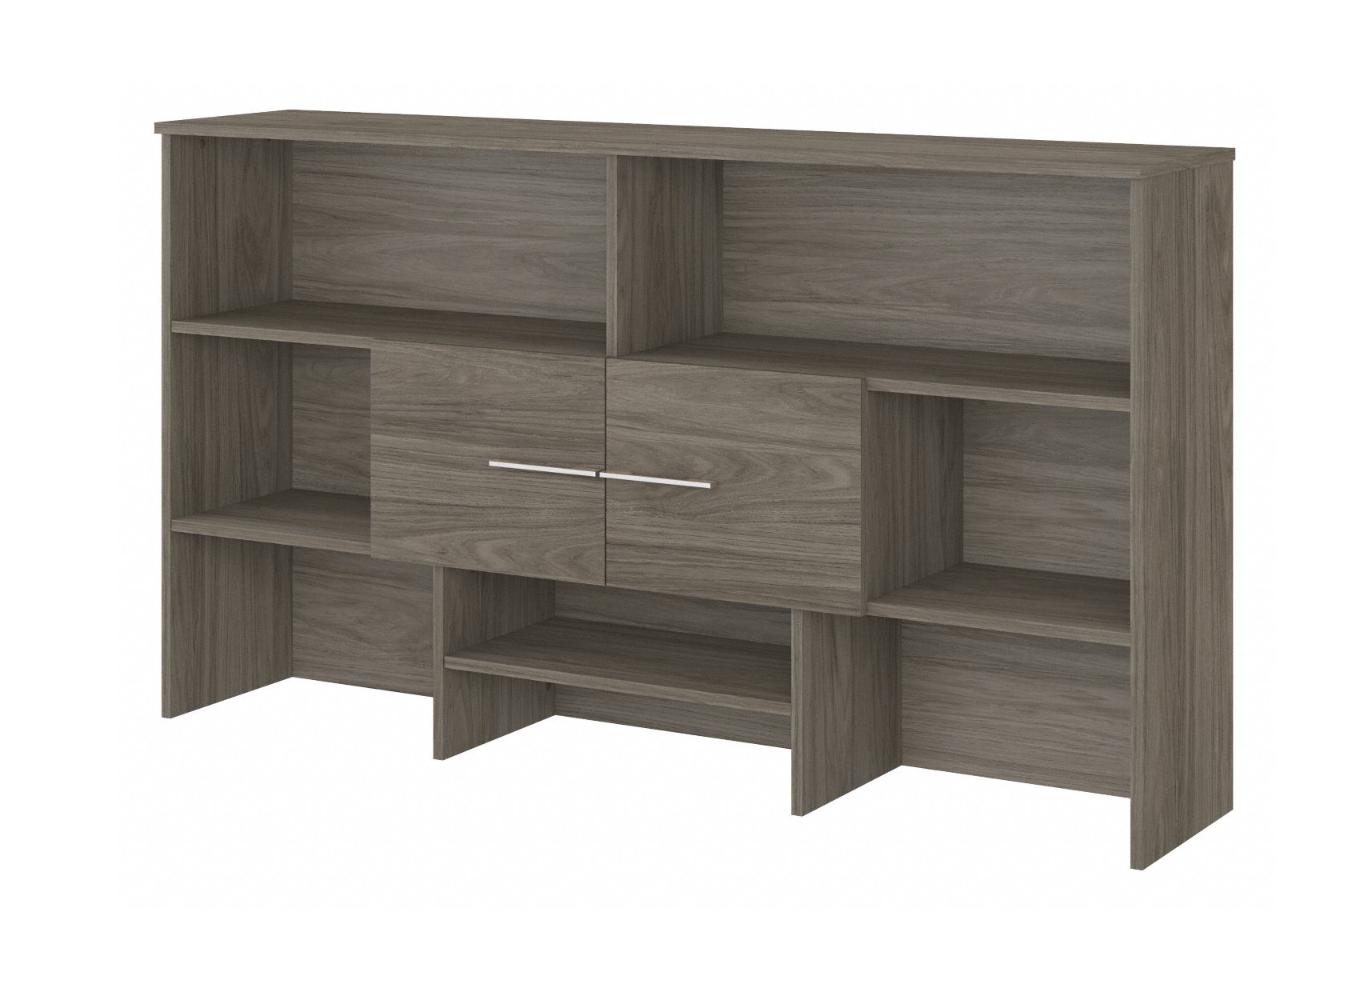 Bush Business Furniture Office 500 72W Desk Hutch